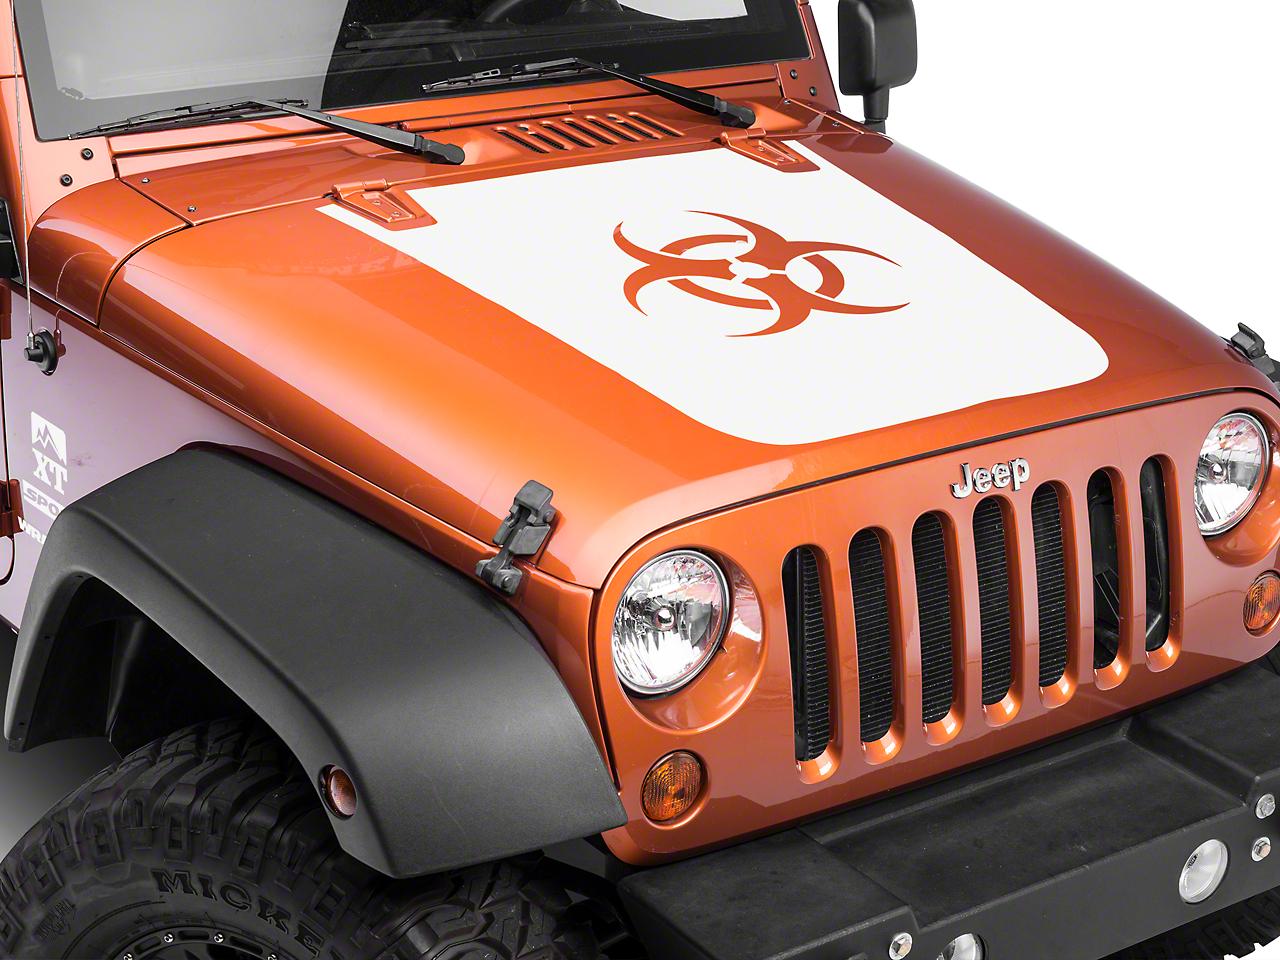 XT Graphics Bio Hazard Hood Decal - White (07-18 Jeep Wrangler JK)